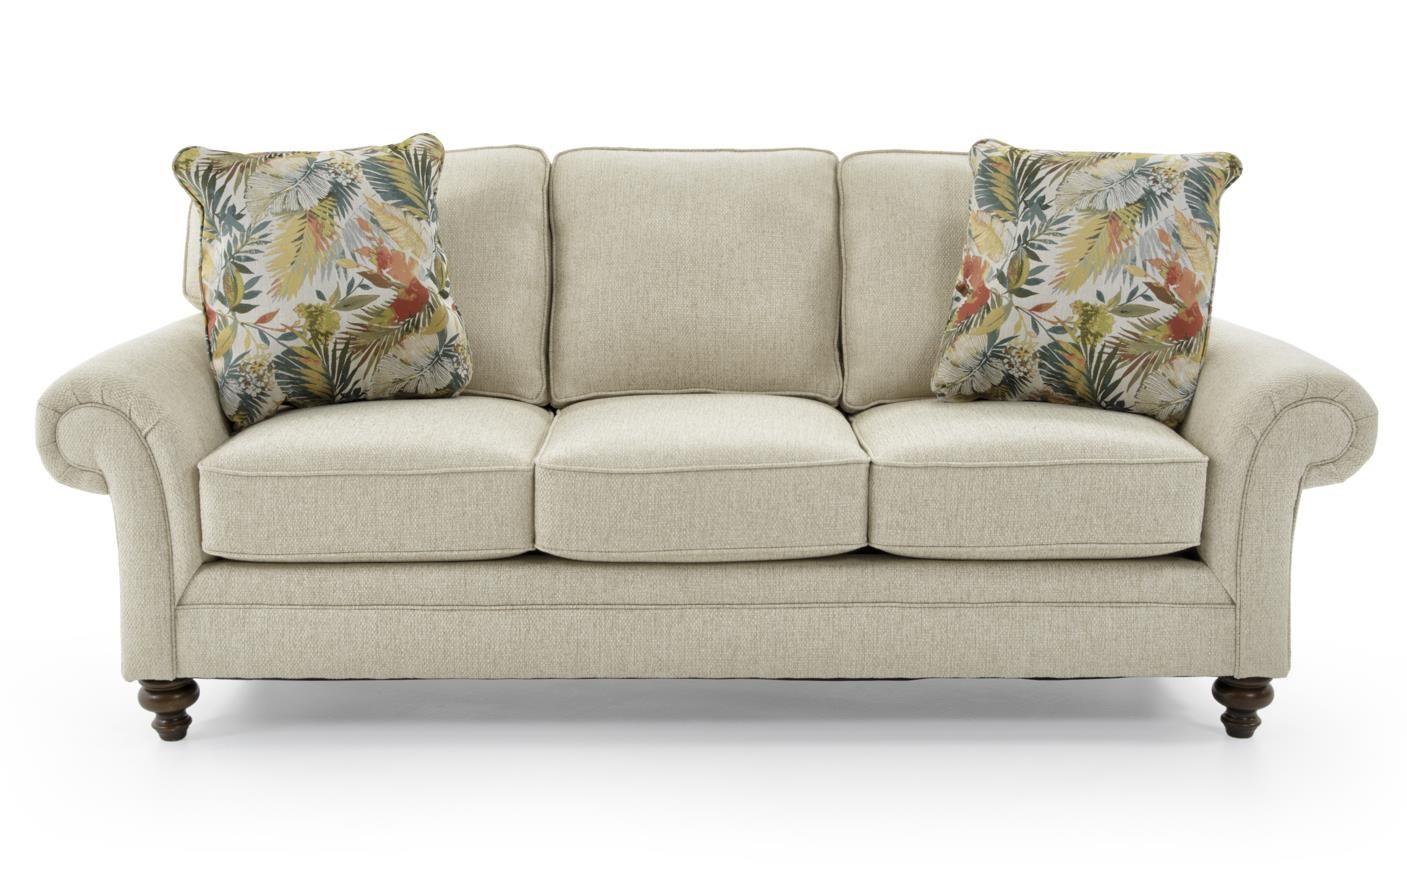 Living room sets orlando fl for Living room furniture orlando